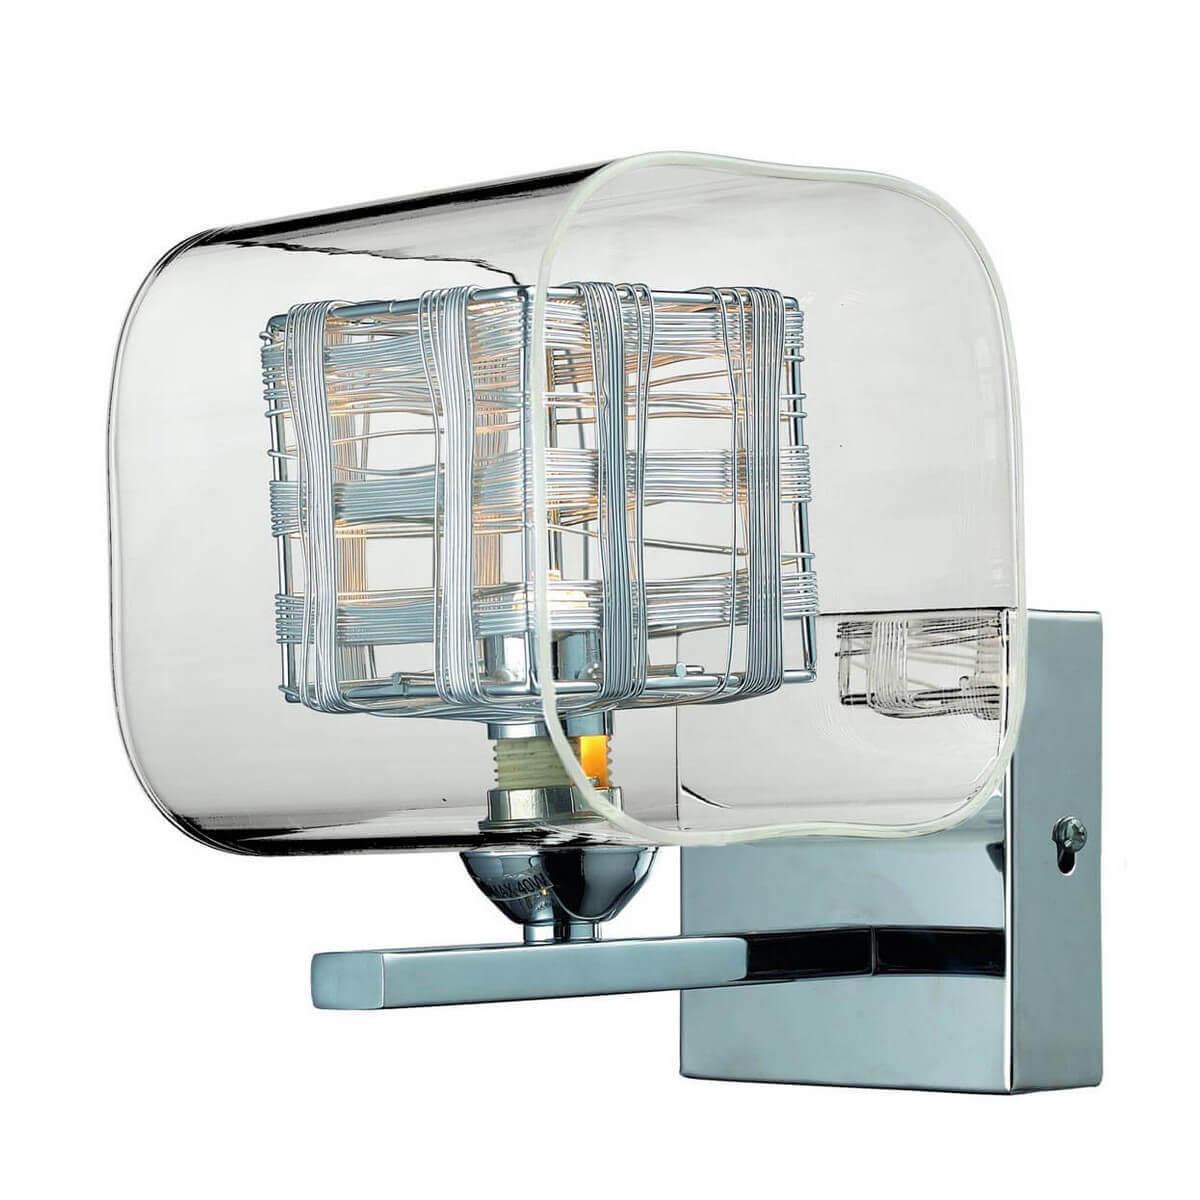 Бра Lussole GRLSC-8001-01 Sorso бра lussole sorso grlsc 8001 01